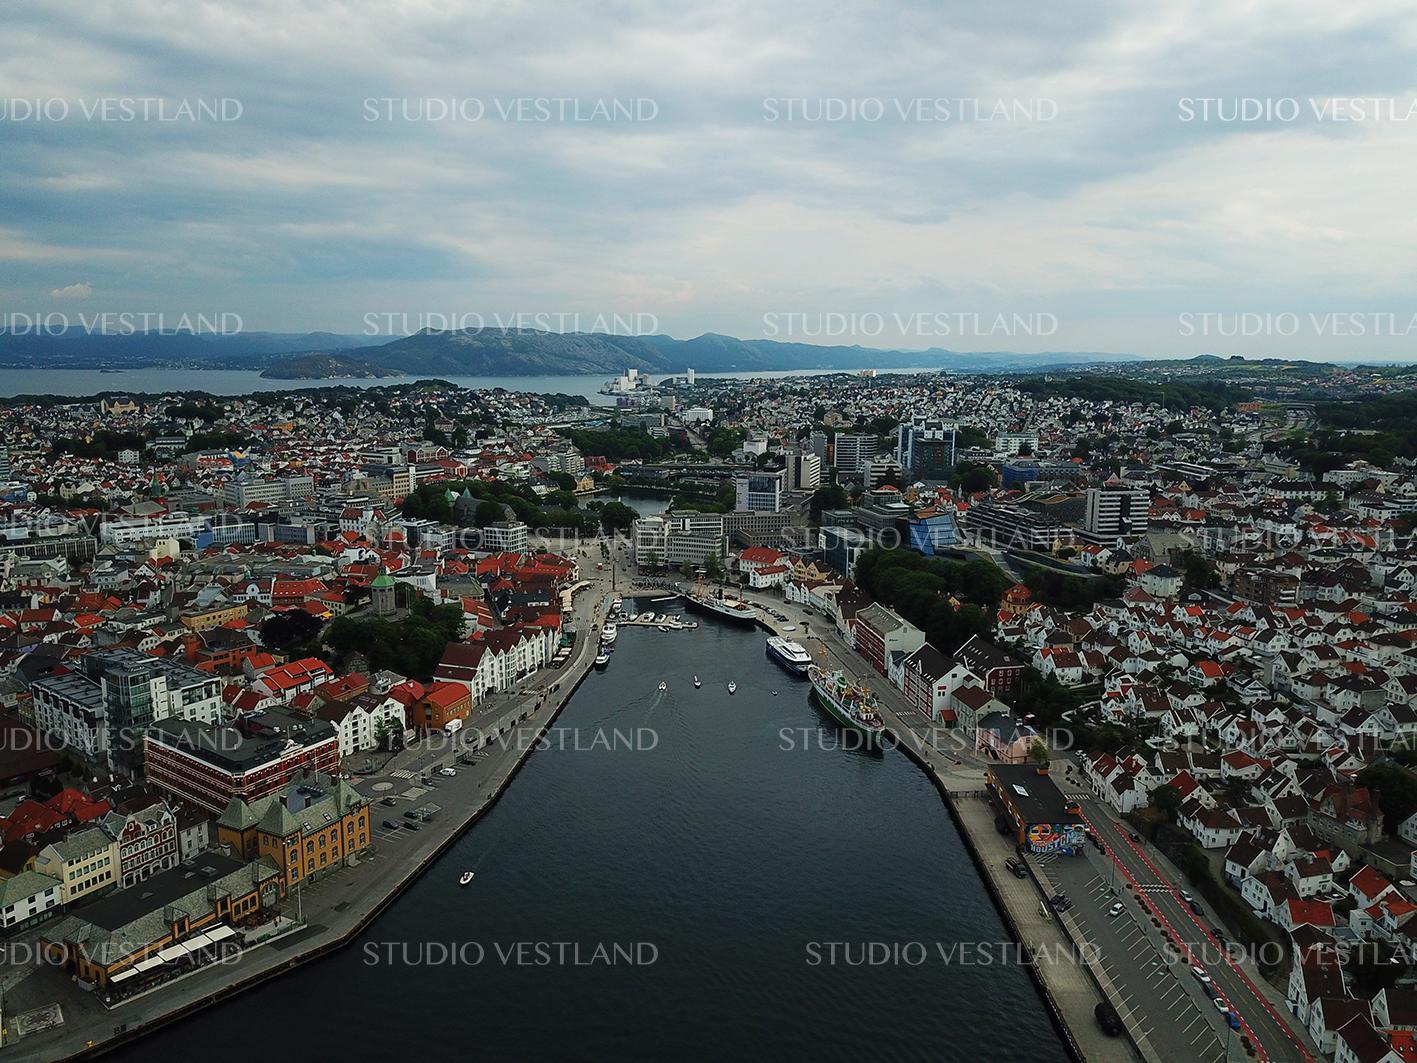 Studio Vestland - Stavanger 29